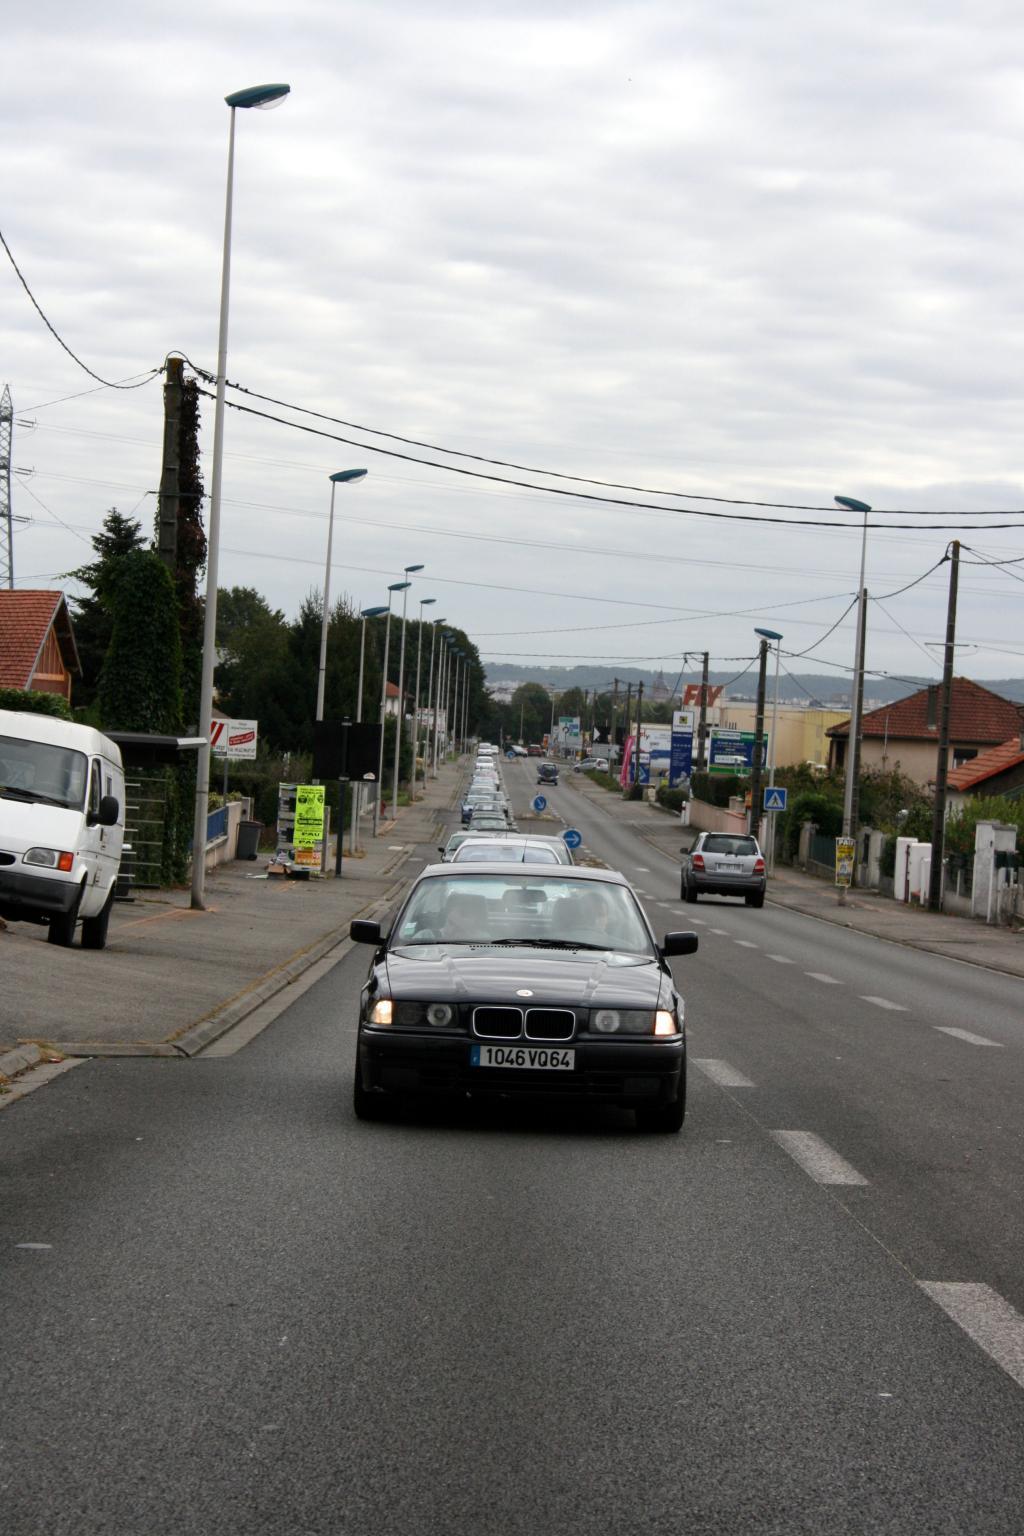 2em edition du rasso du sud ouest a tarbes oct 2012 Img_8836-38d04f9